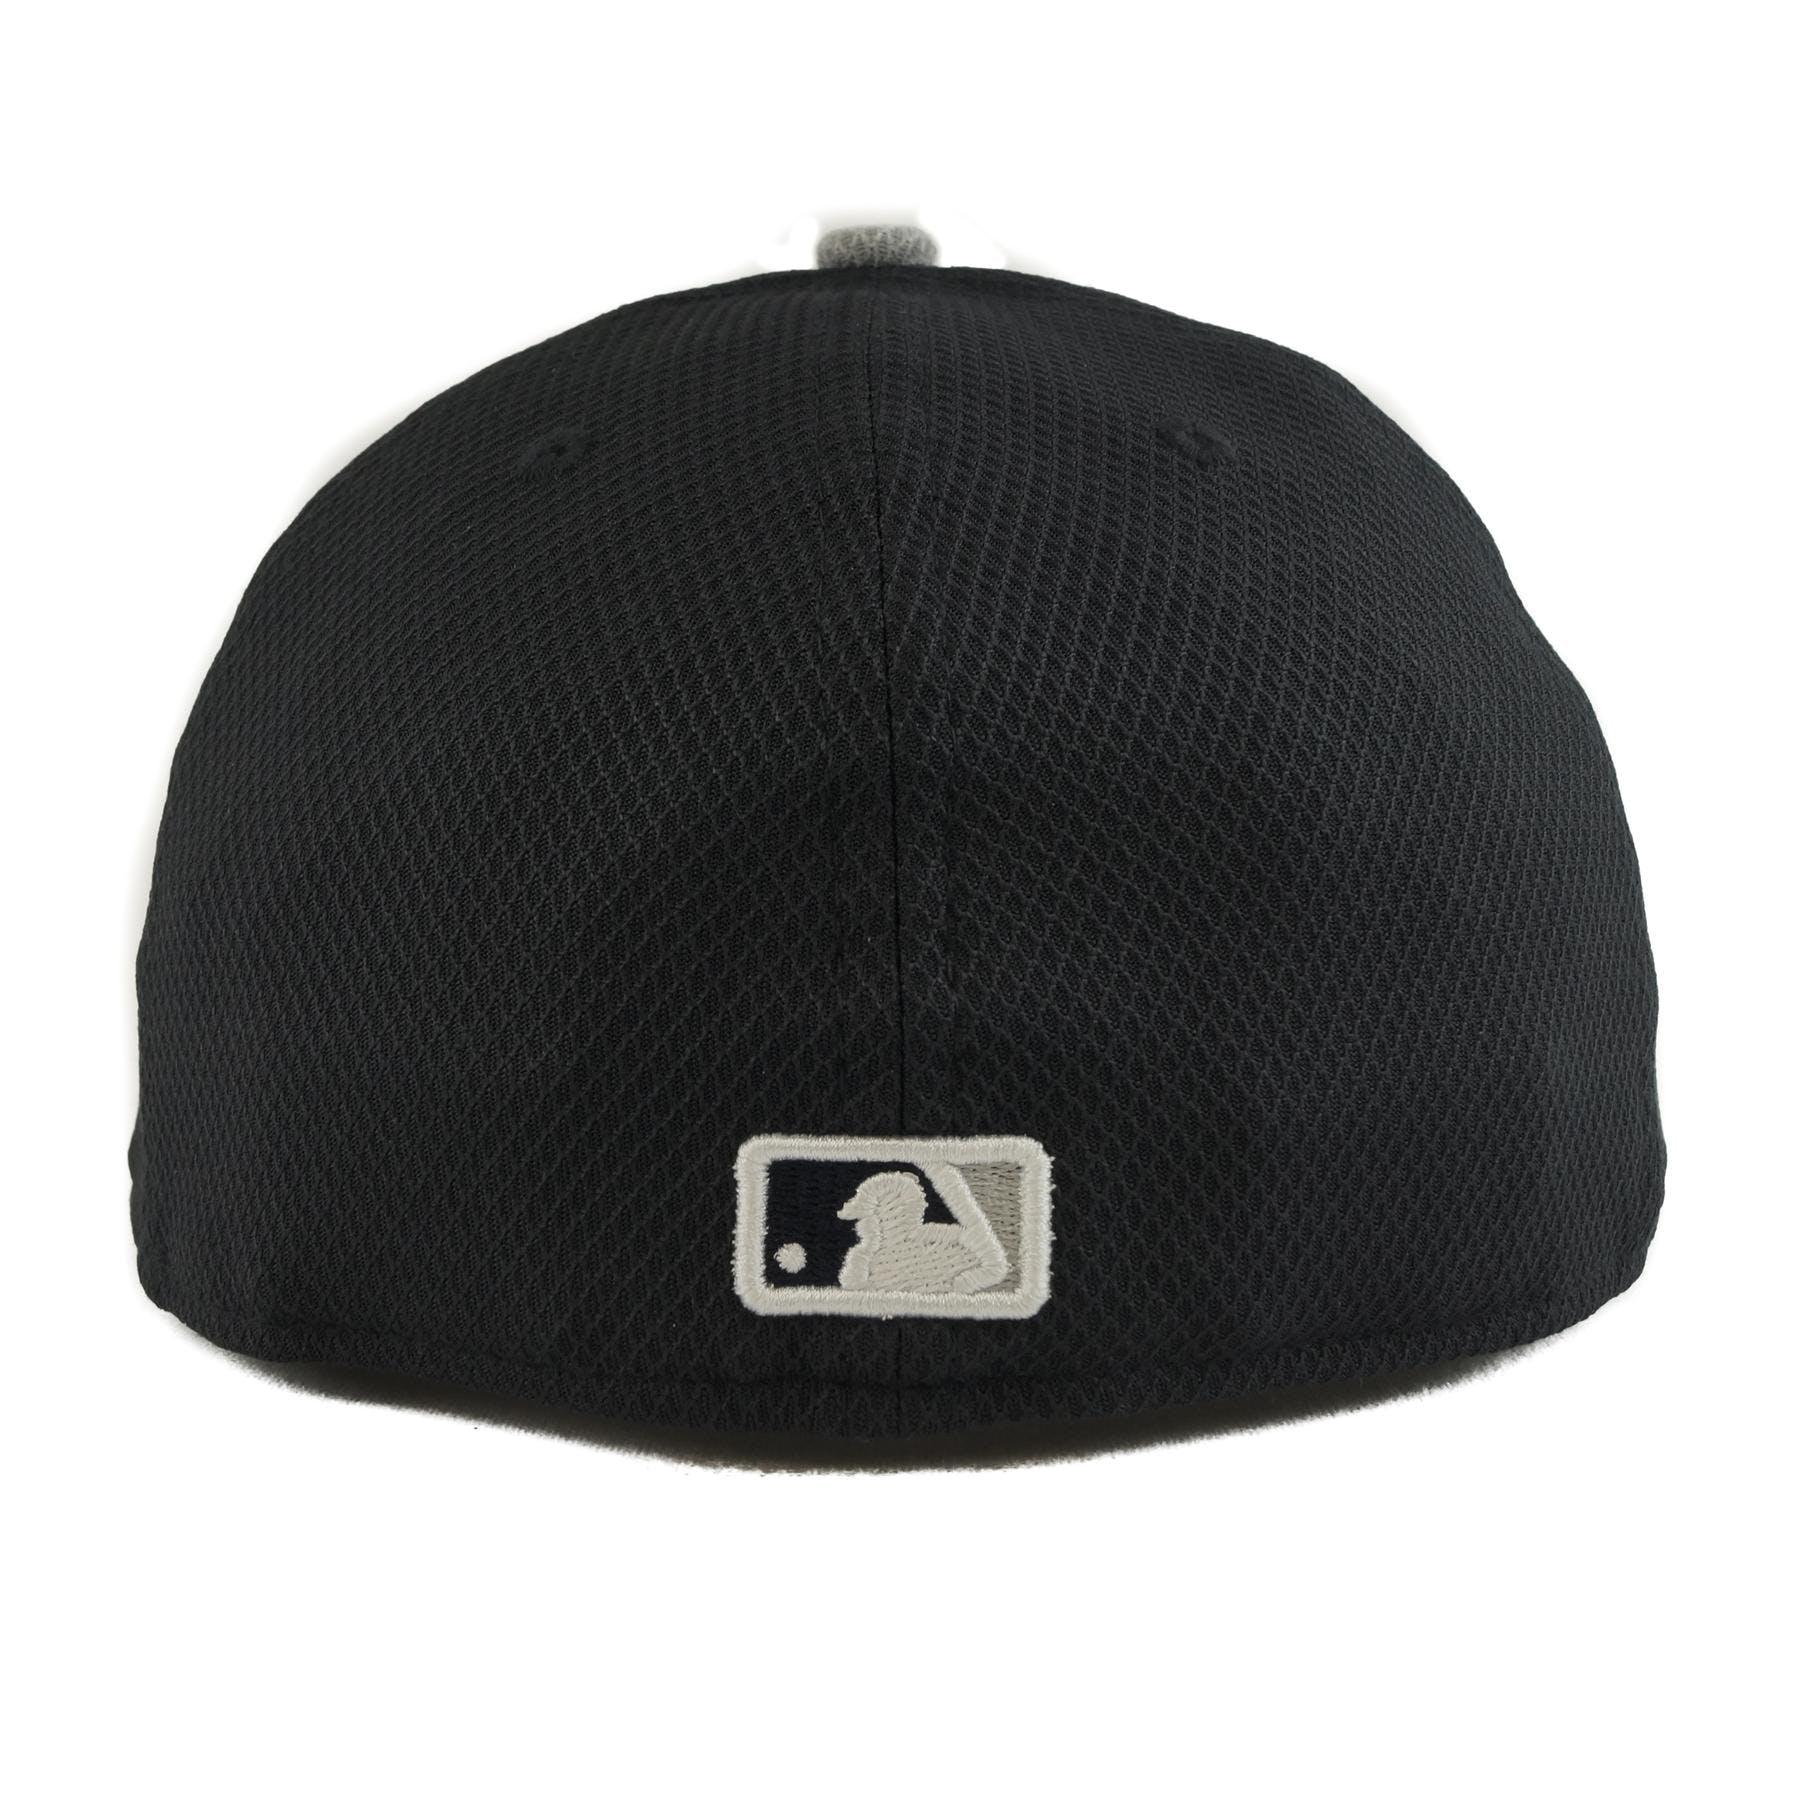 e0ec65fb0de06 New York Yankees New Era Diamond Era 59Fifty Fitted Navy   Gray Hat ...